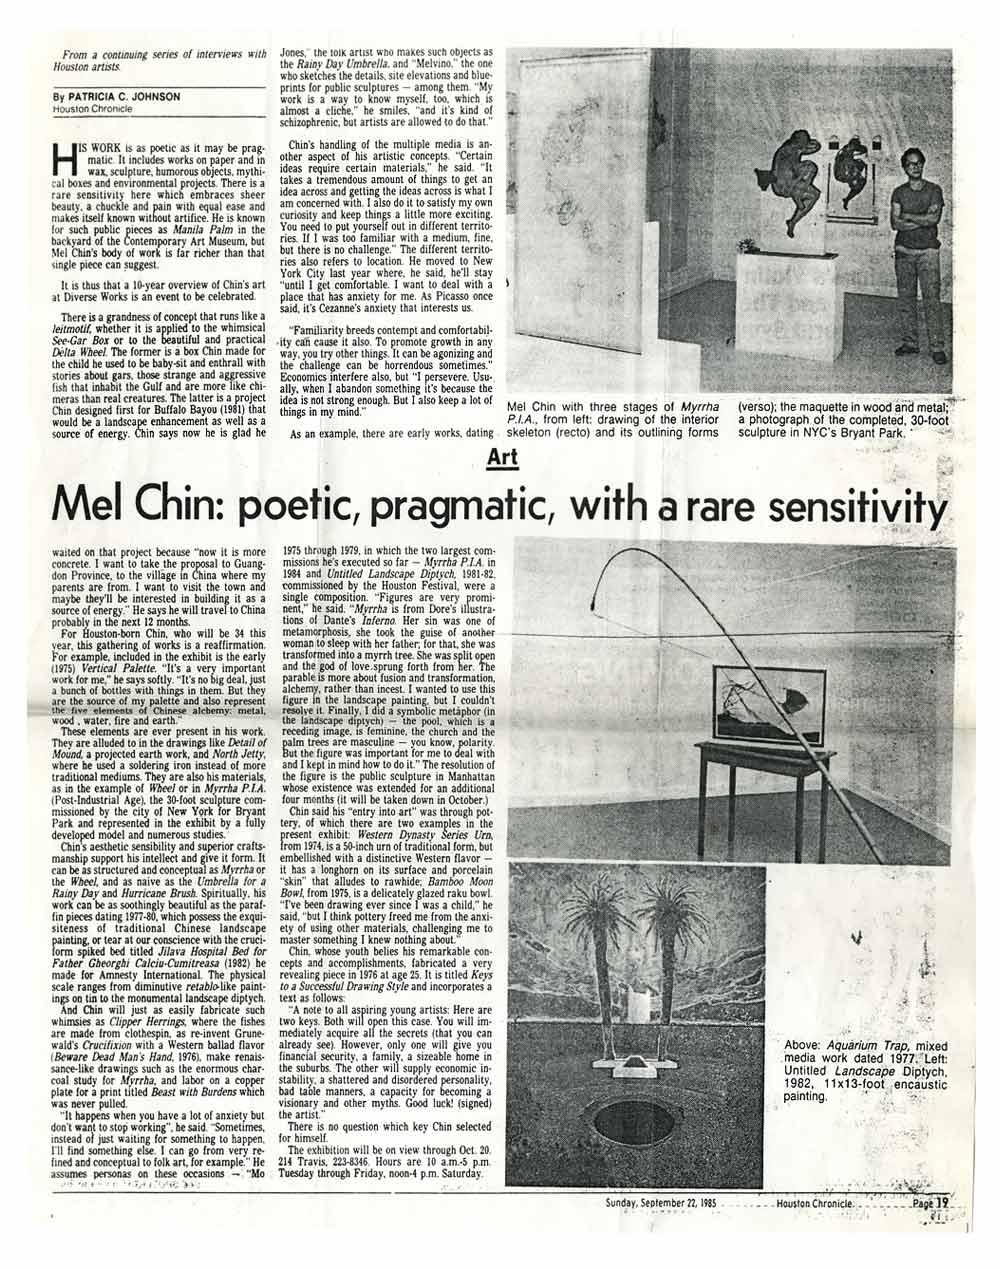 Chin: poetic, pragmatic